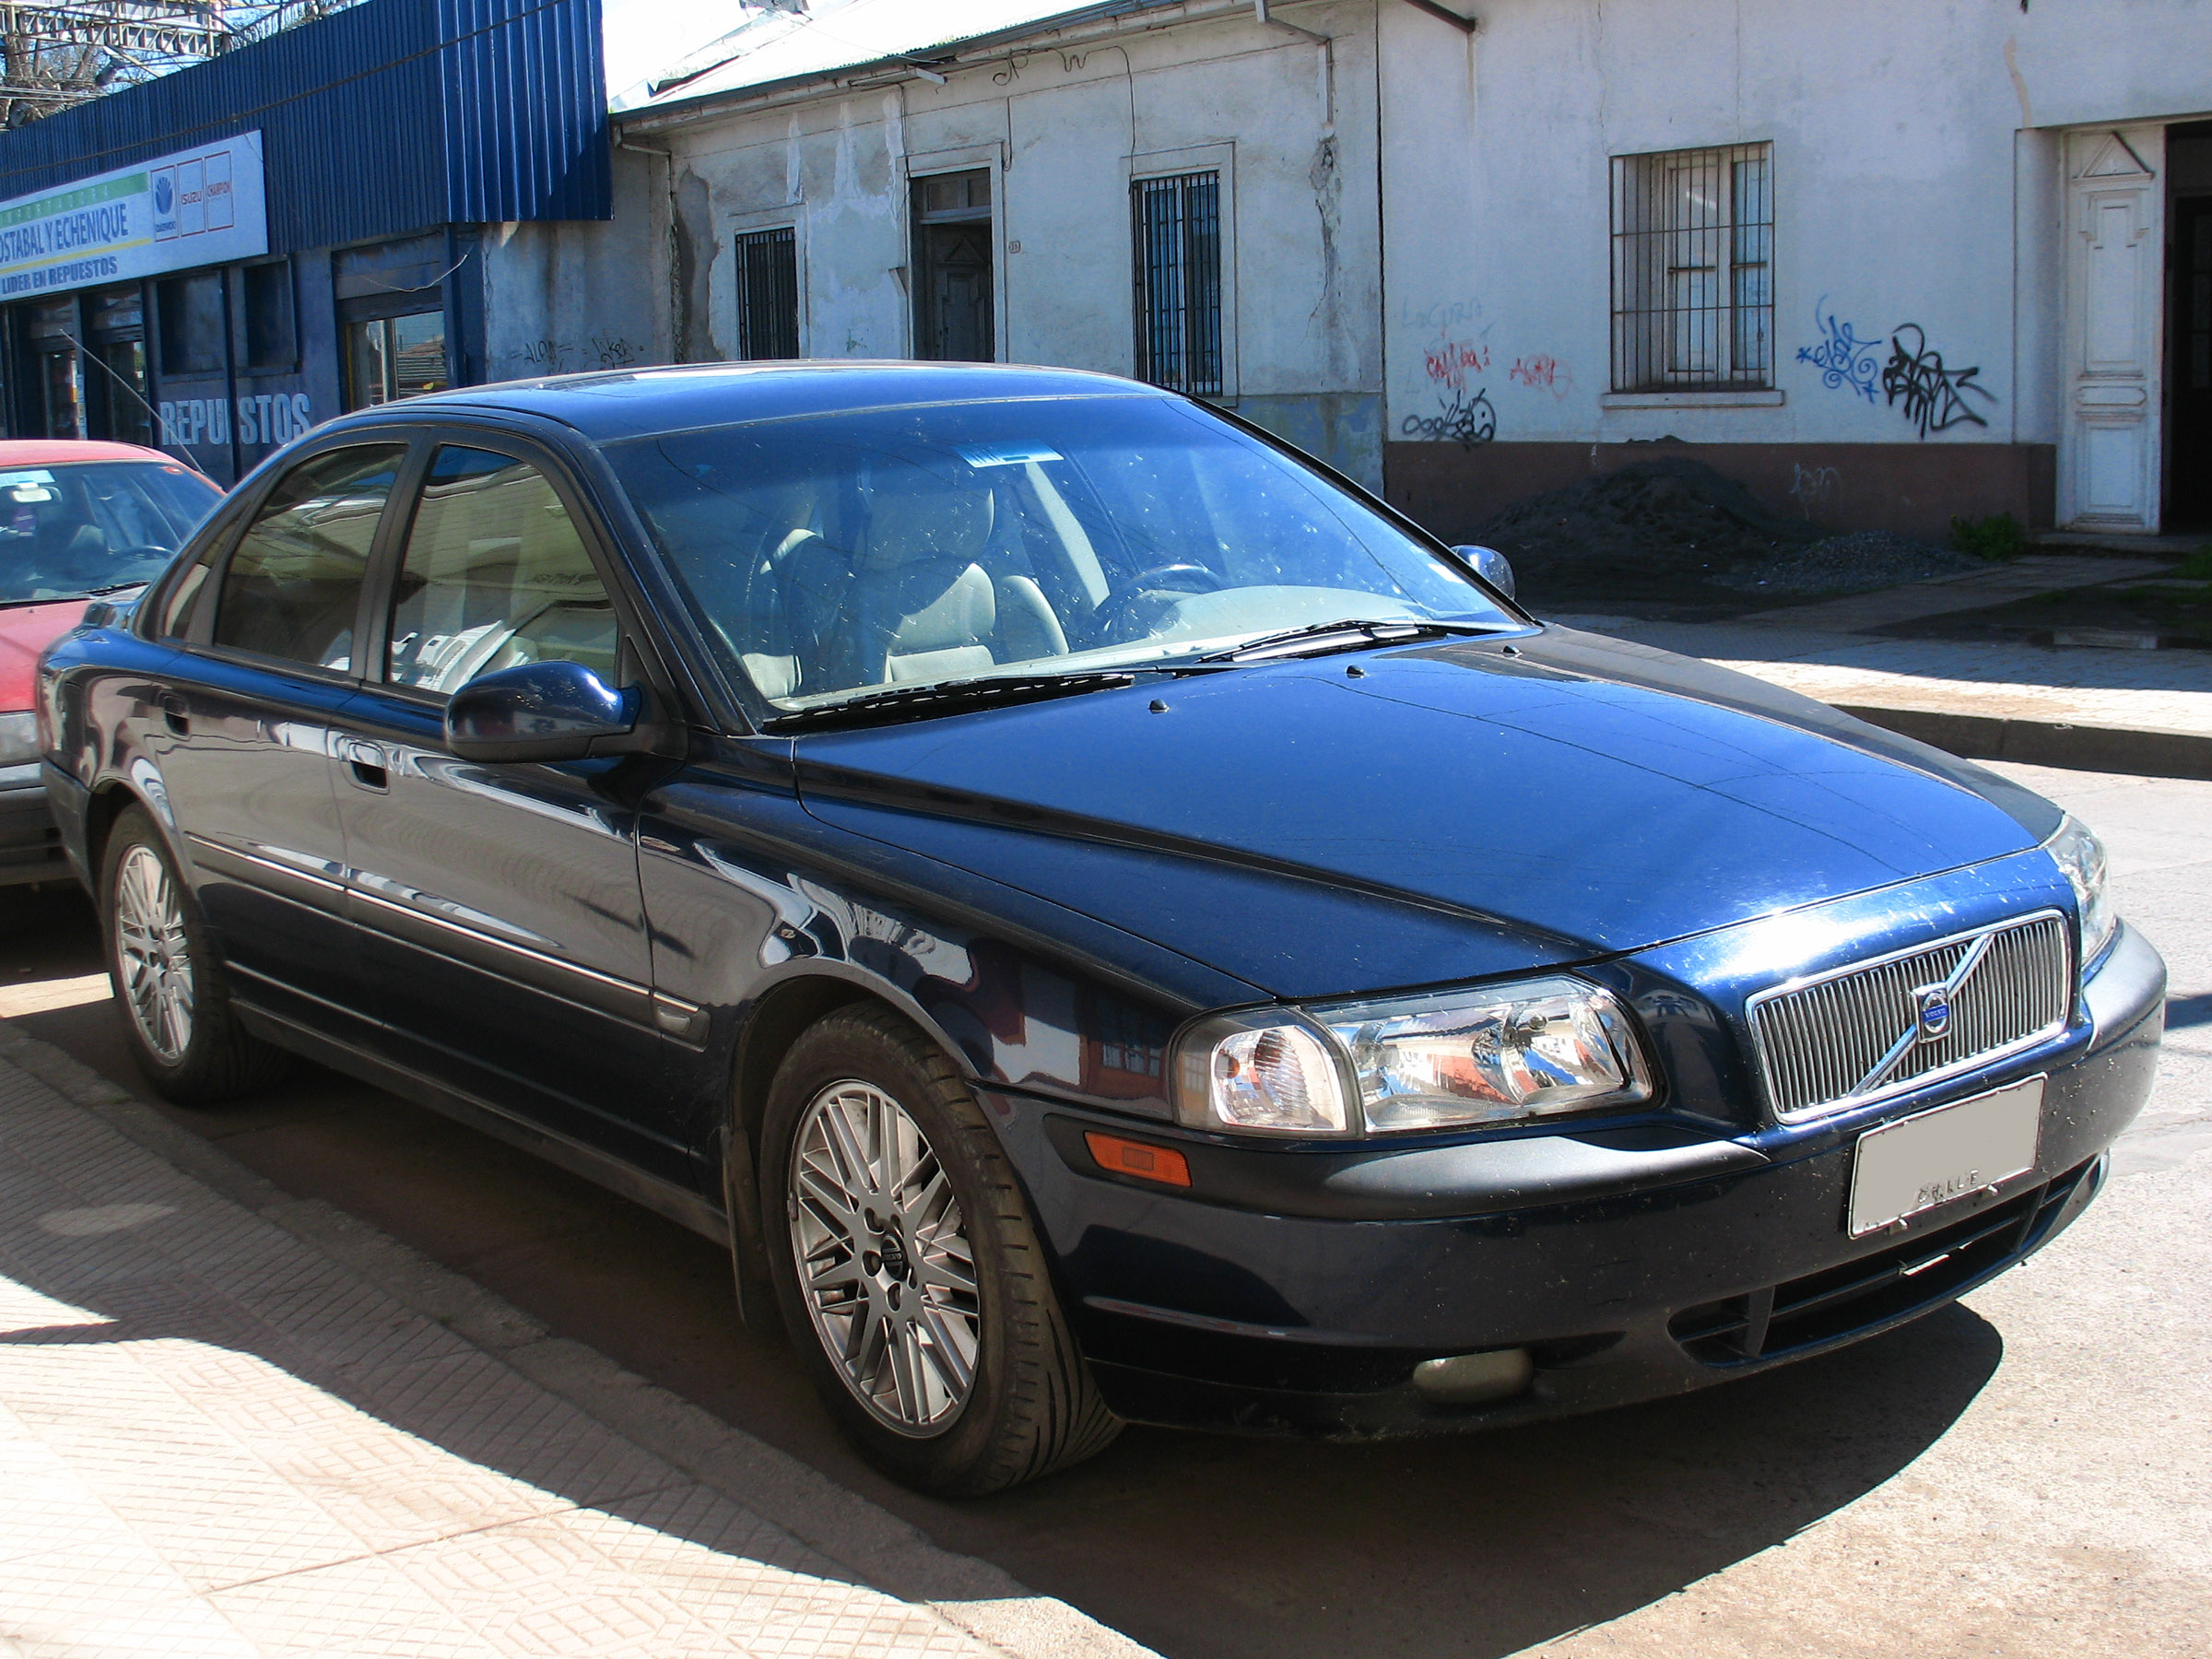 File:Volvo S80 T6 2001 (9567225194).jpg - Wikimedia Commons